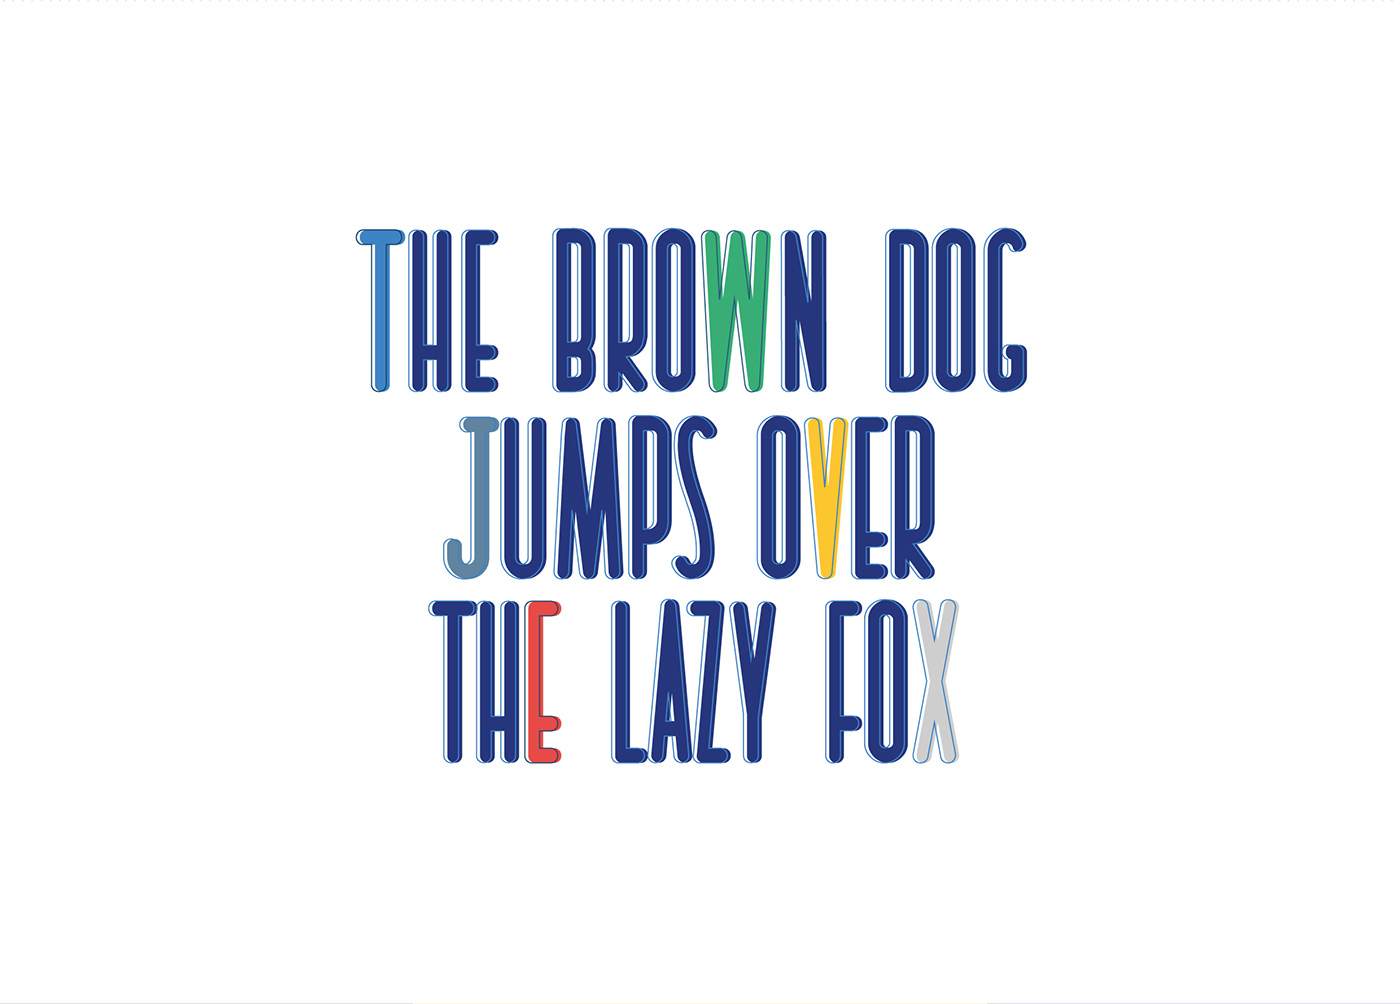 font typography   graphic design  Typeface sans-serif modern Bodrum type download childish